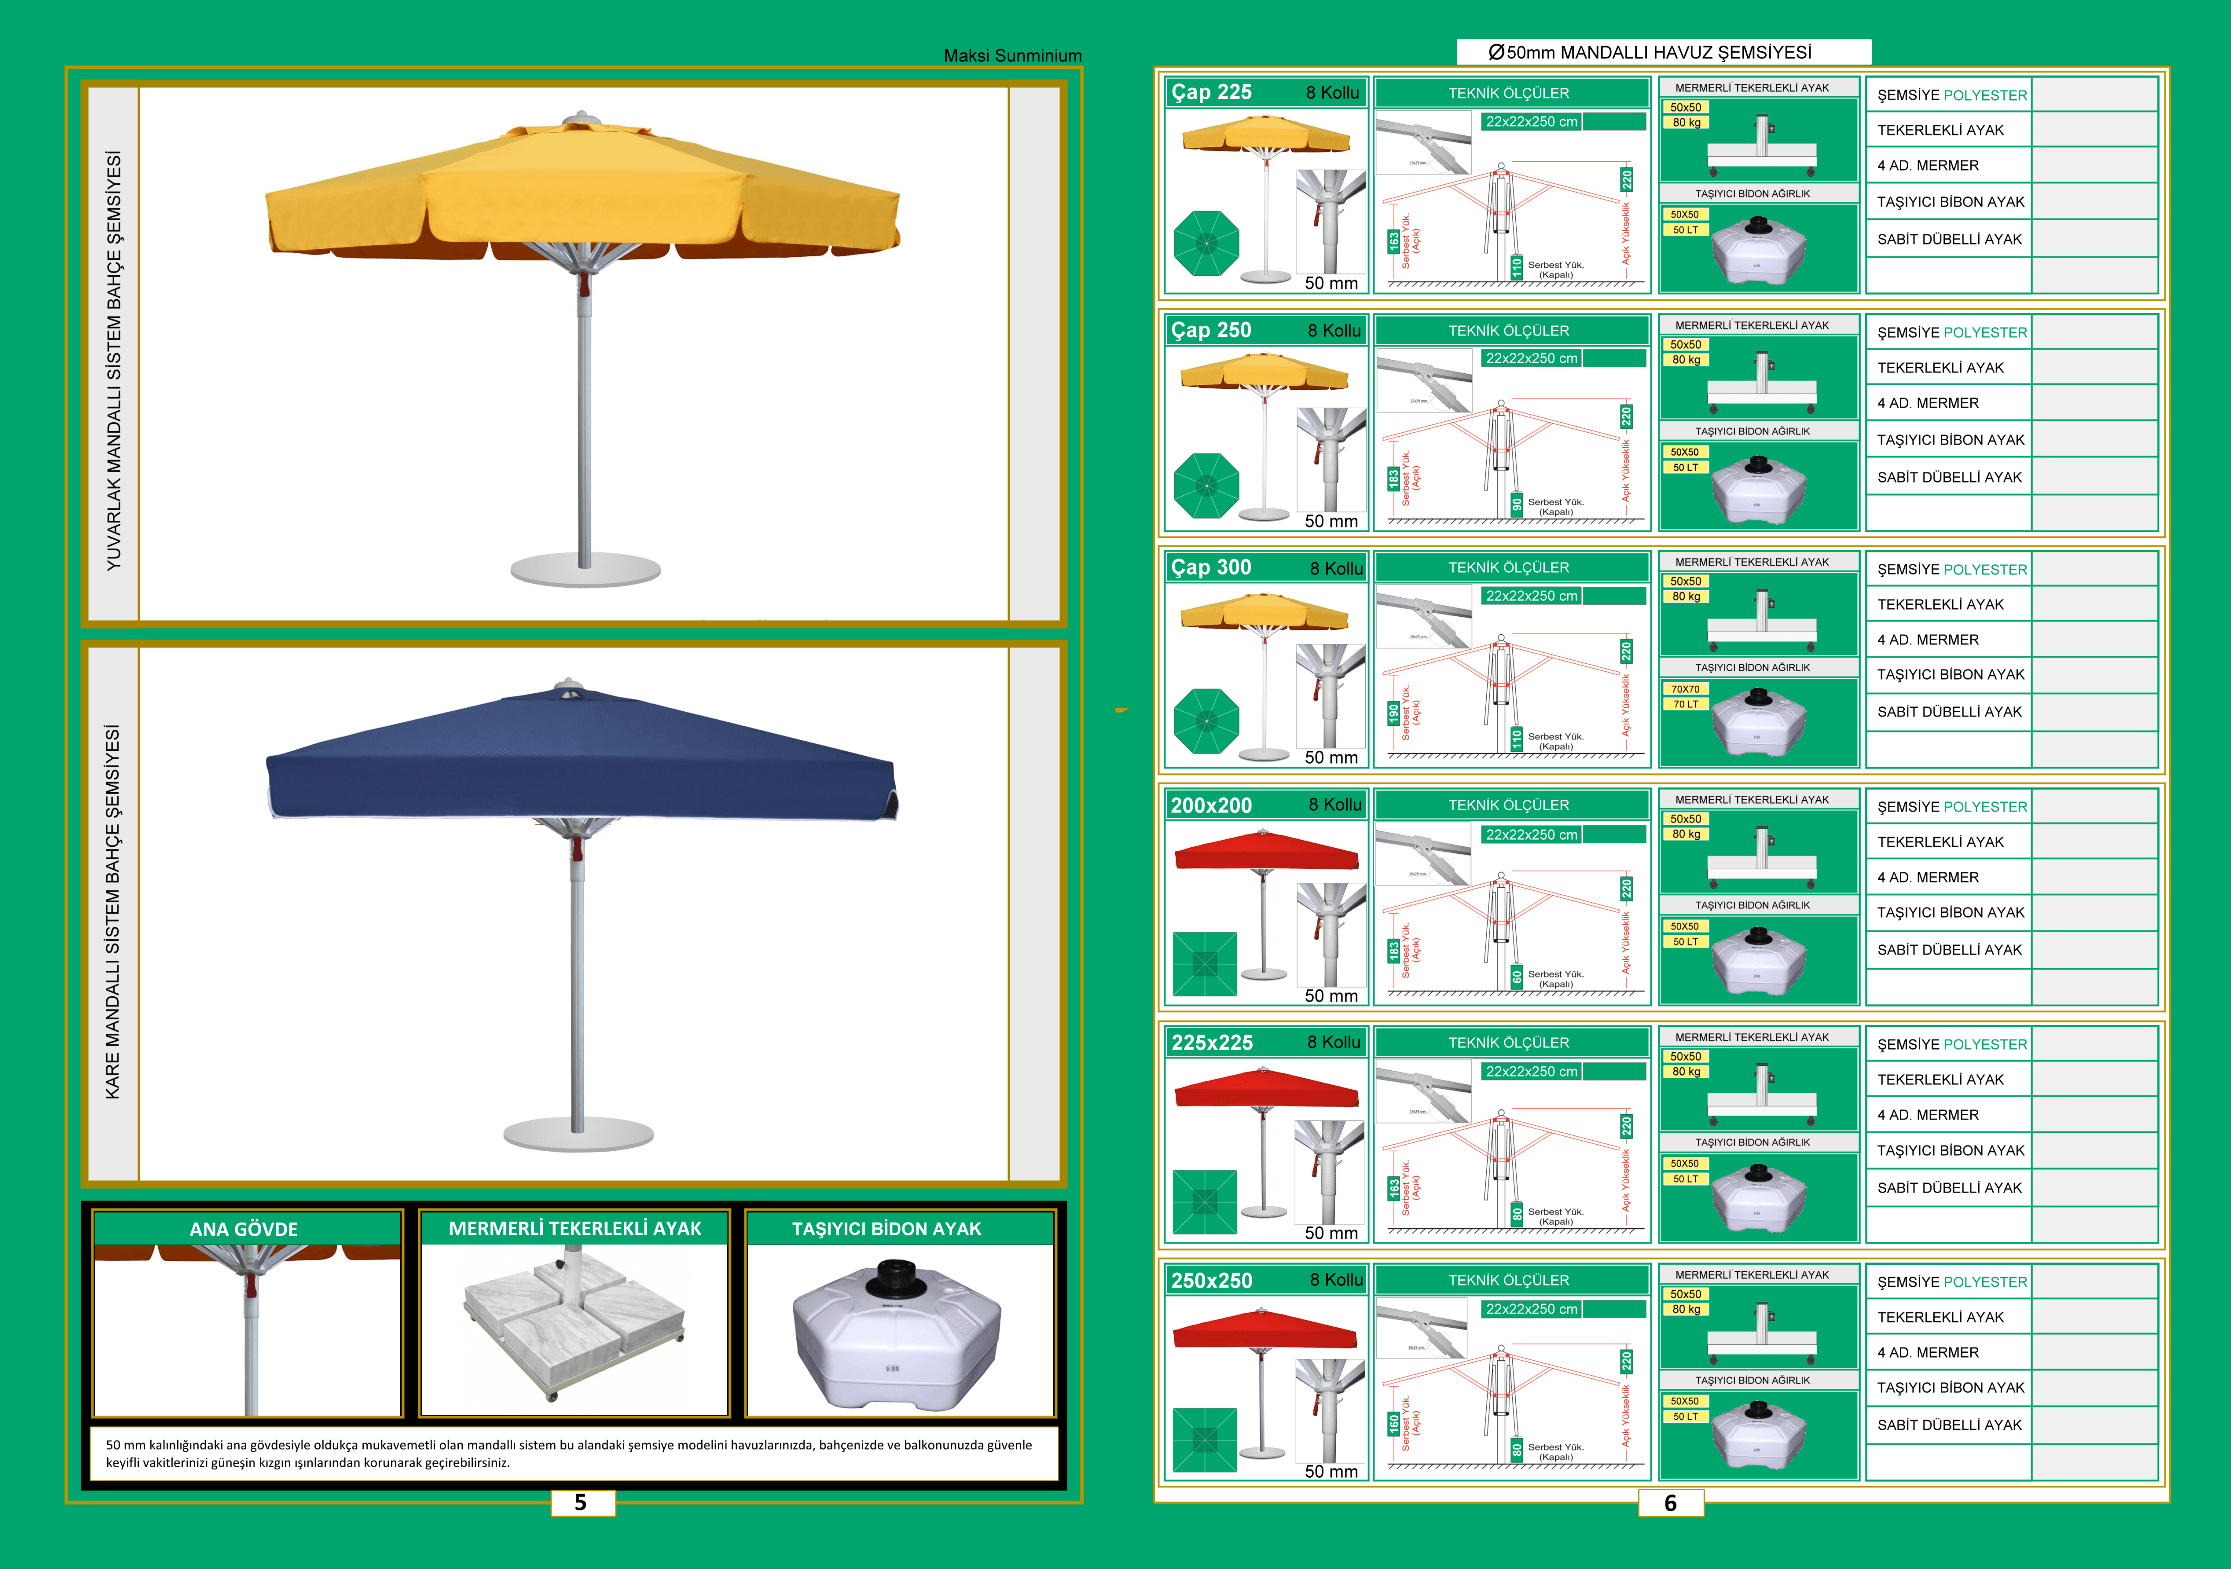 50 mm mandallı güneş şemsiyesi